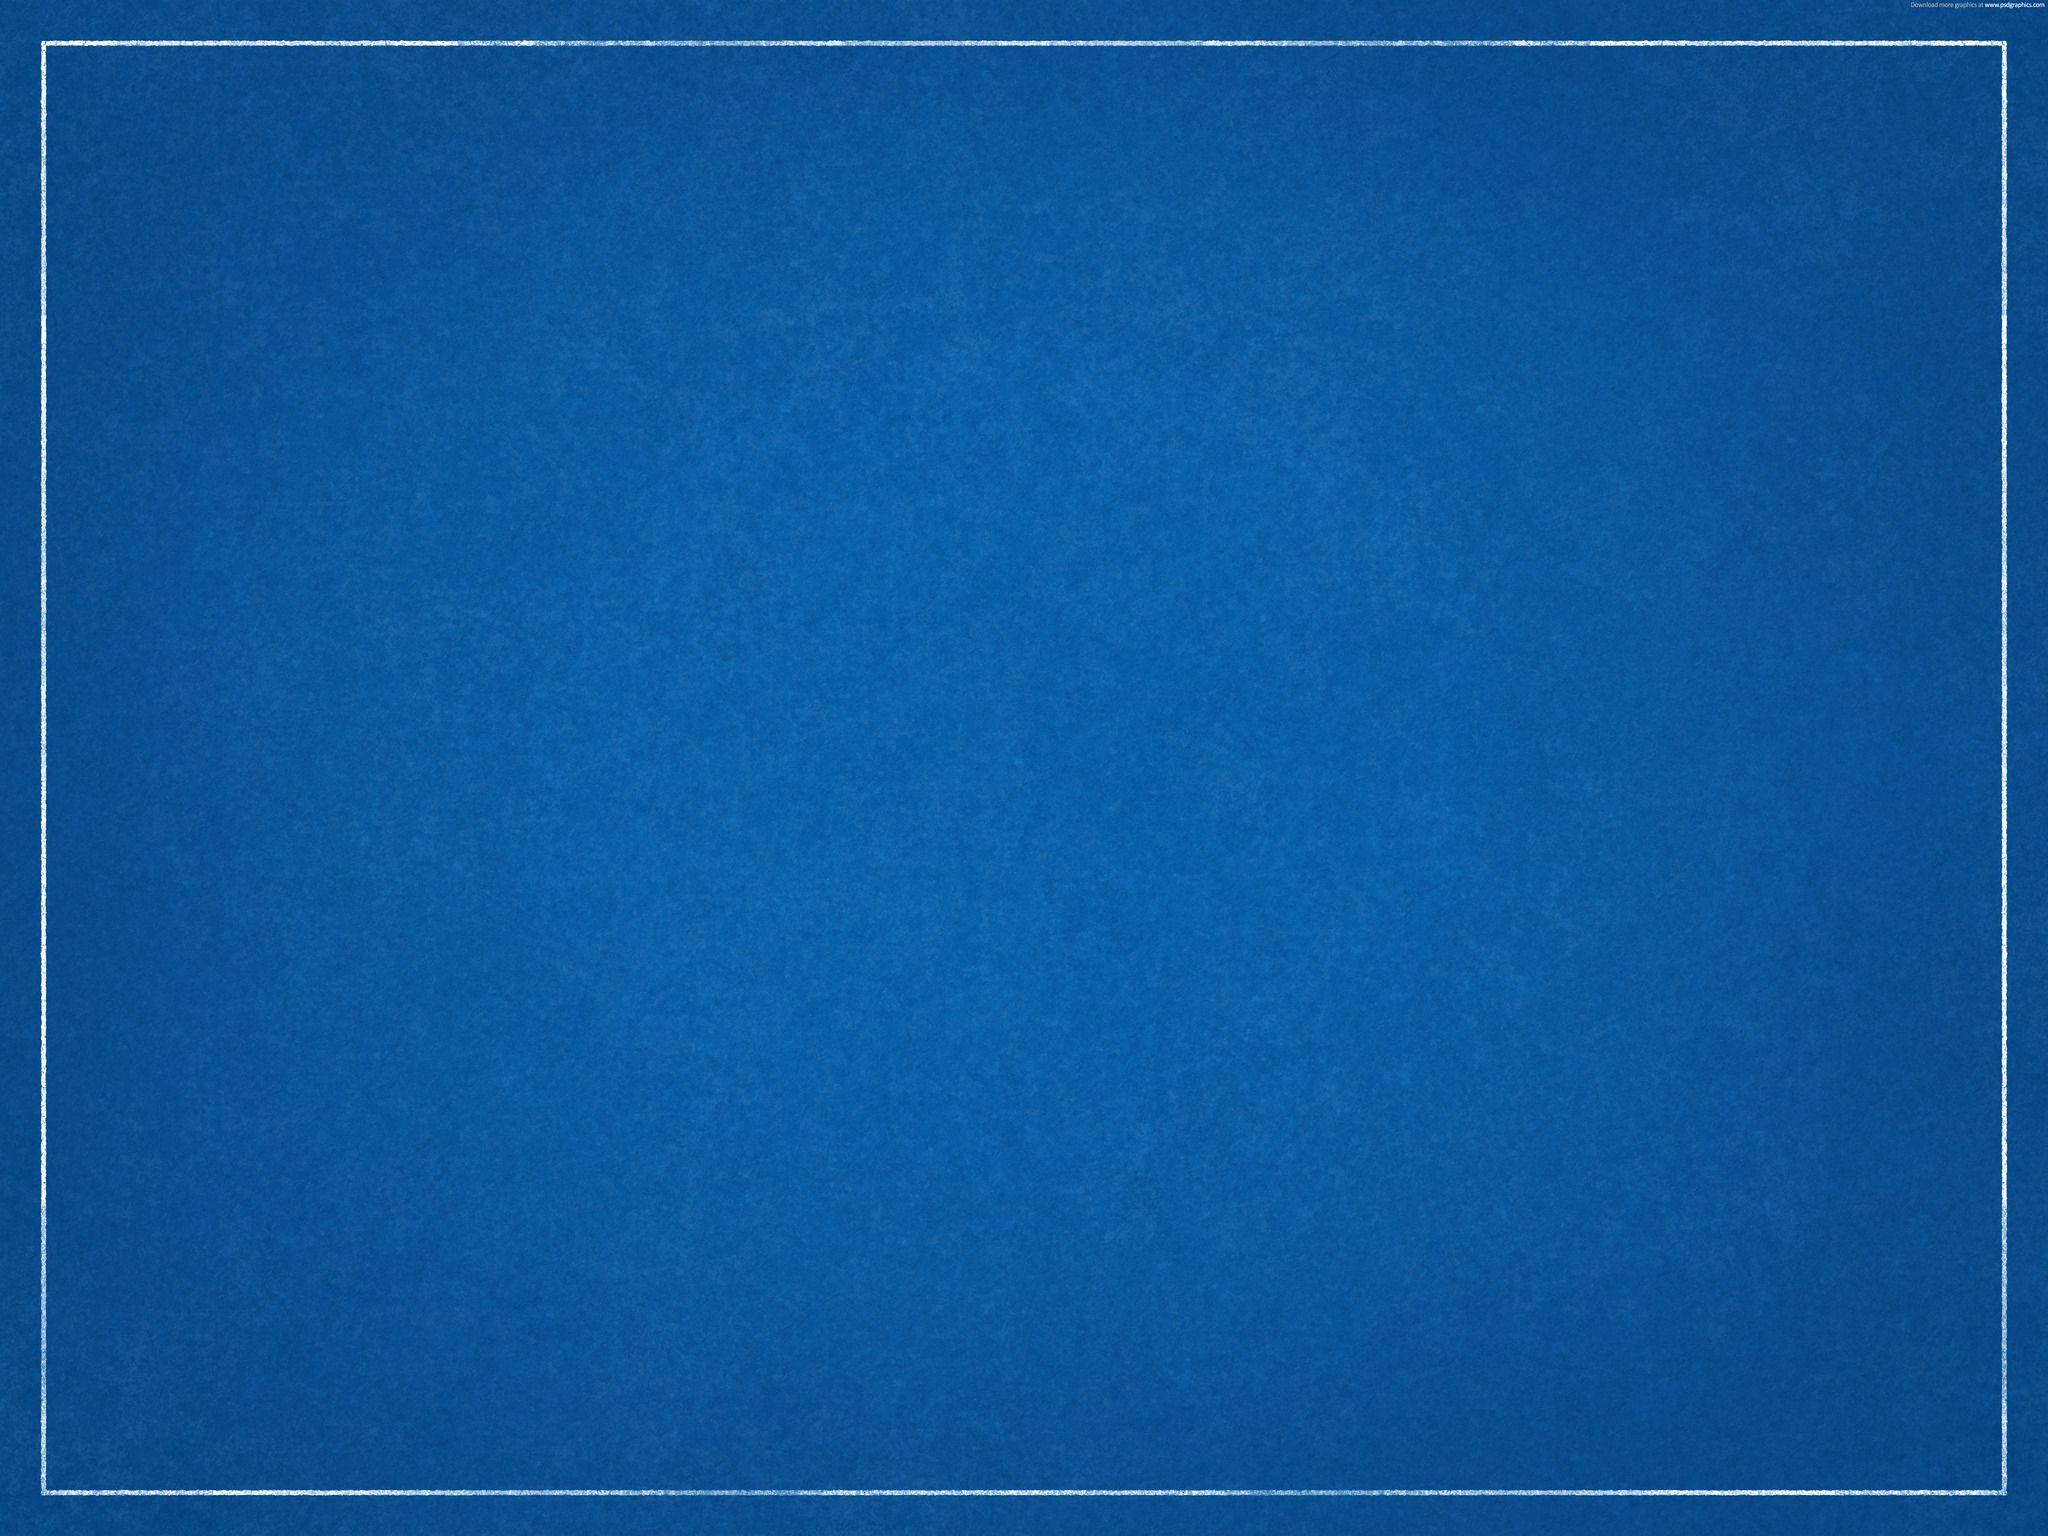 Photoshop 50 Fondos Fullhd Para Vos Nuevos Blue Fabric Blue Paper Texture Plain Wallpaper